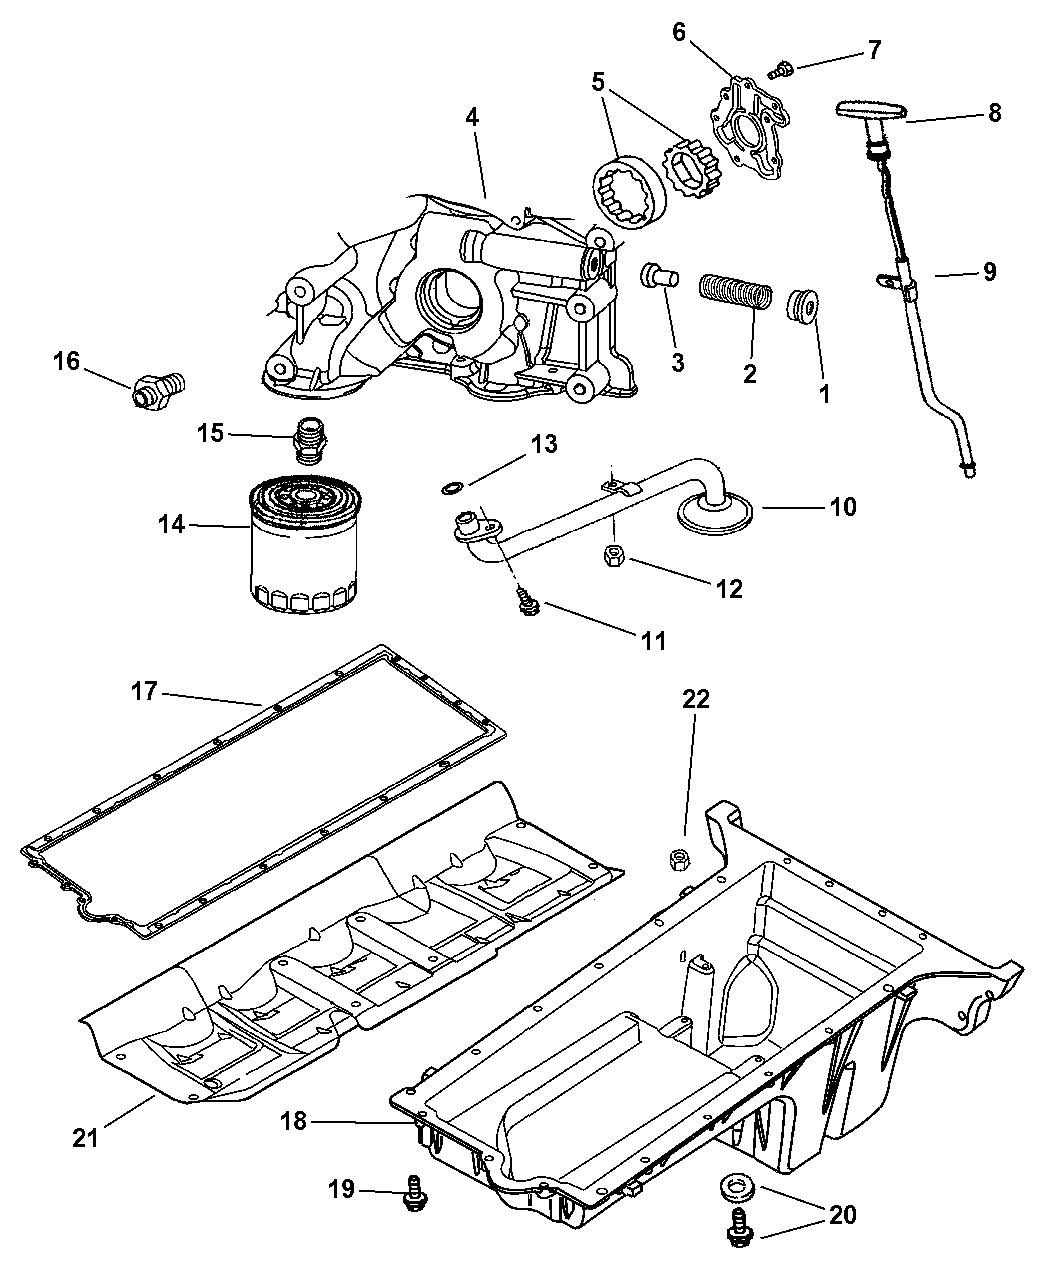 2005 dodge viper engine oiling